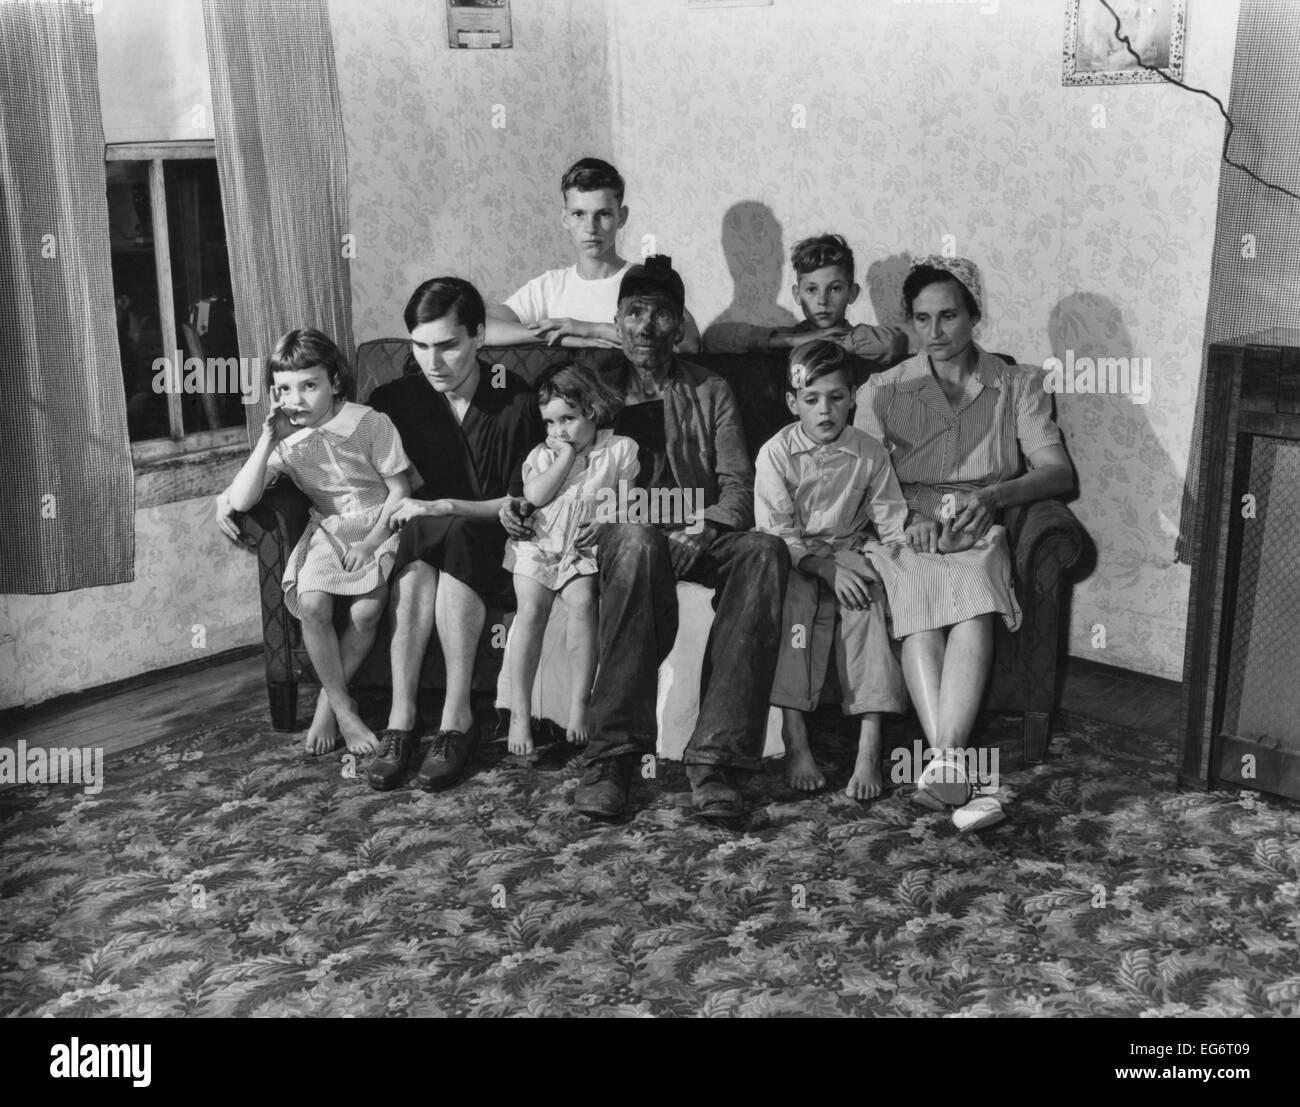 Woman Children 1940s Stock Photos & Woman Children 1940s ...